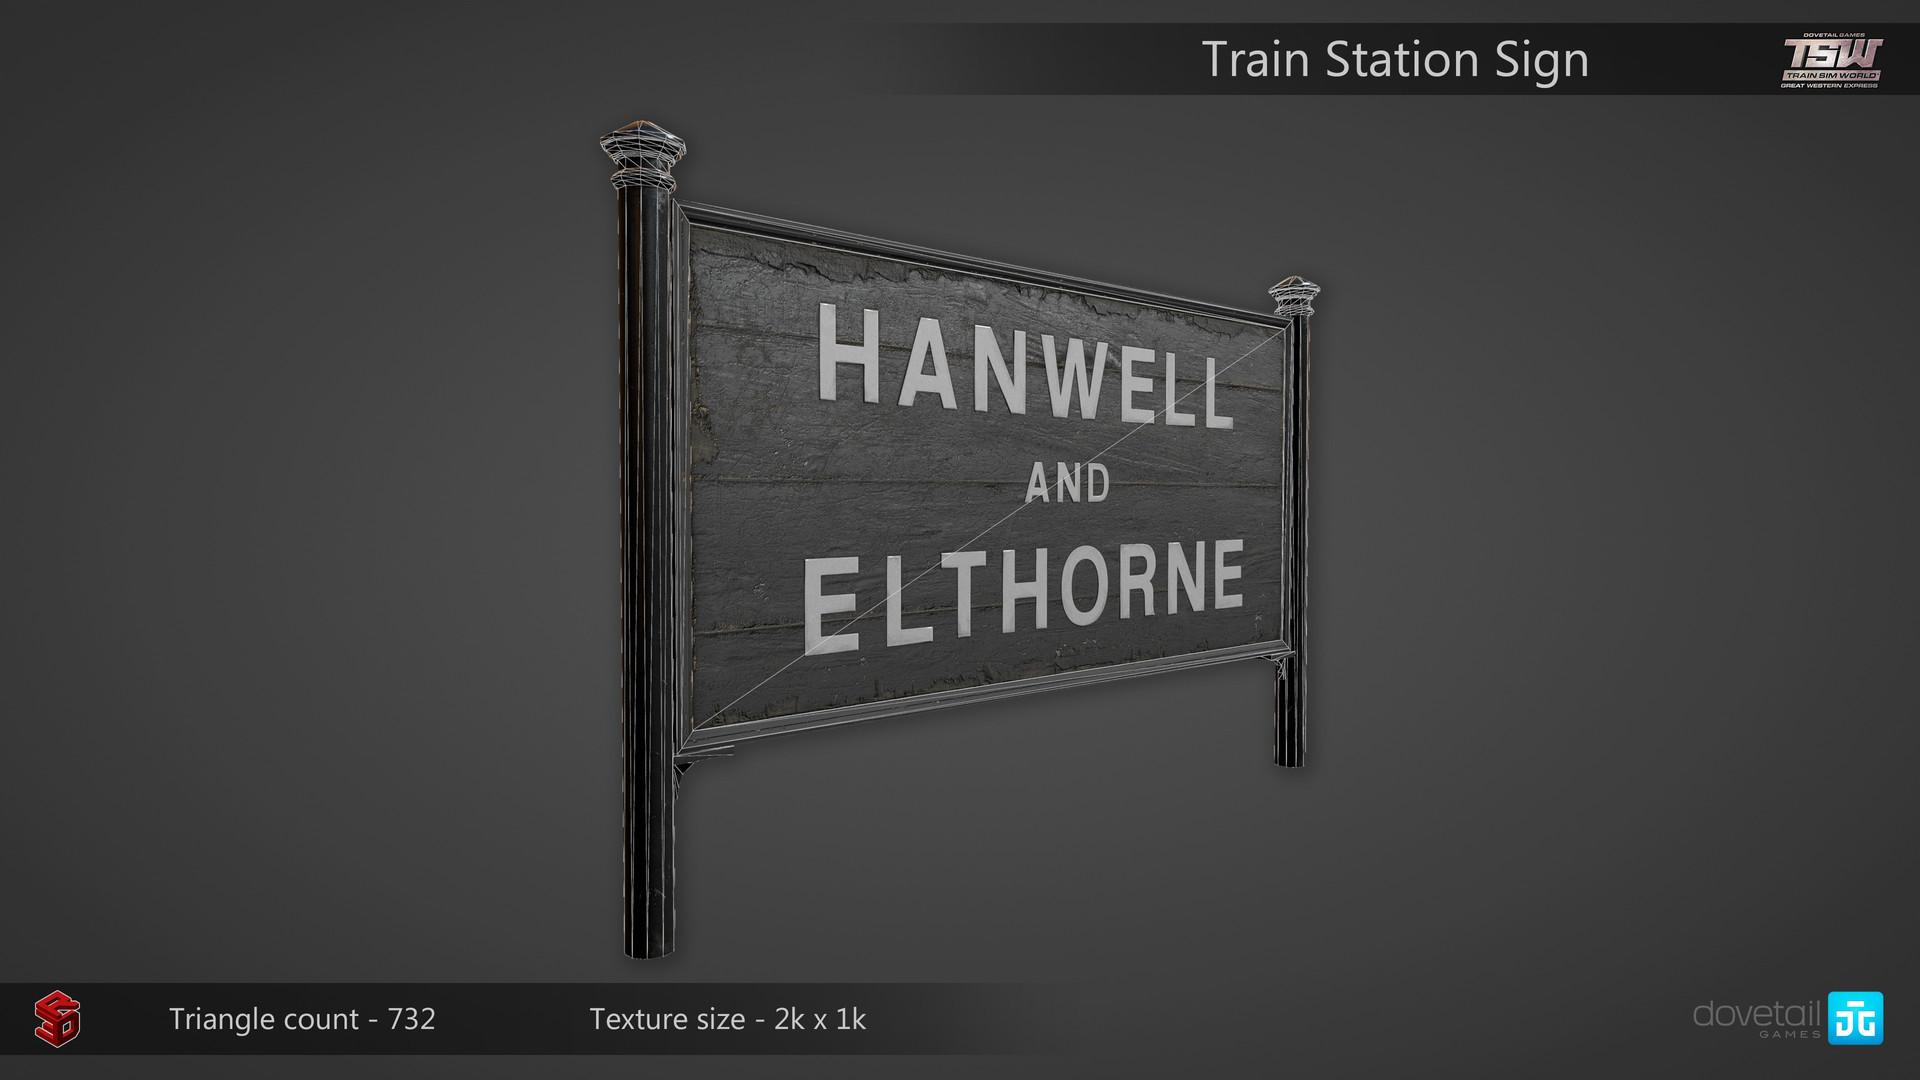 Ross mccafferty trainstationsign 06